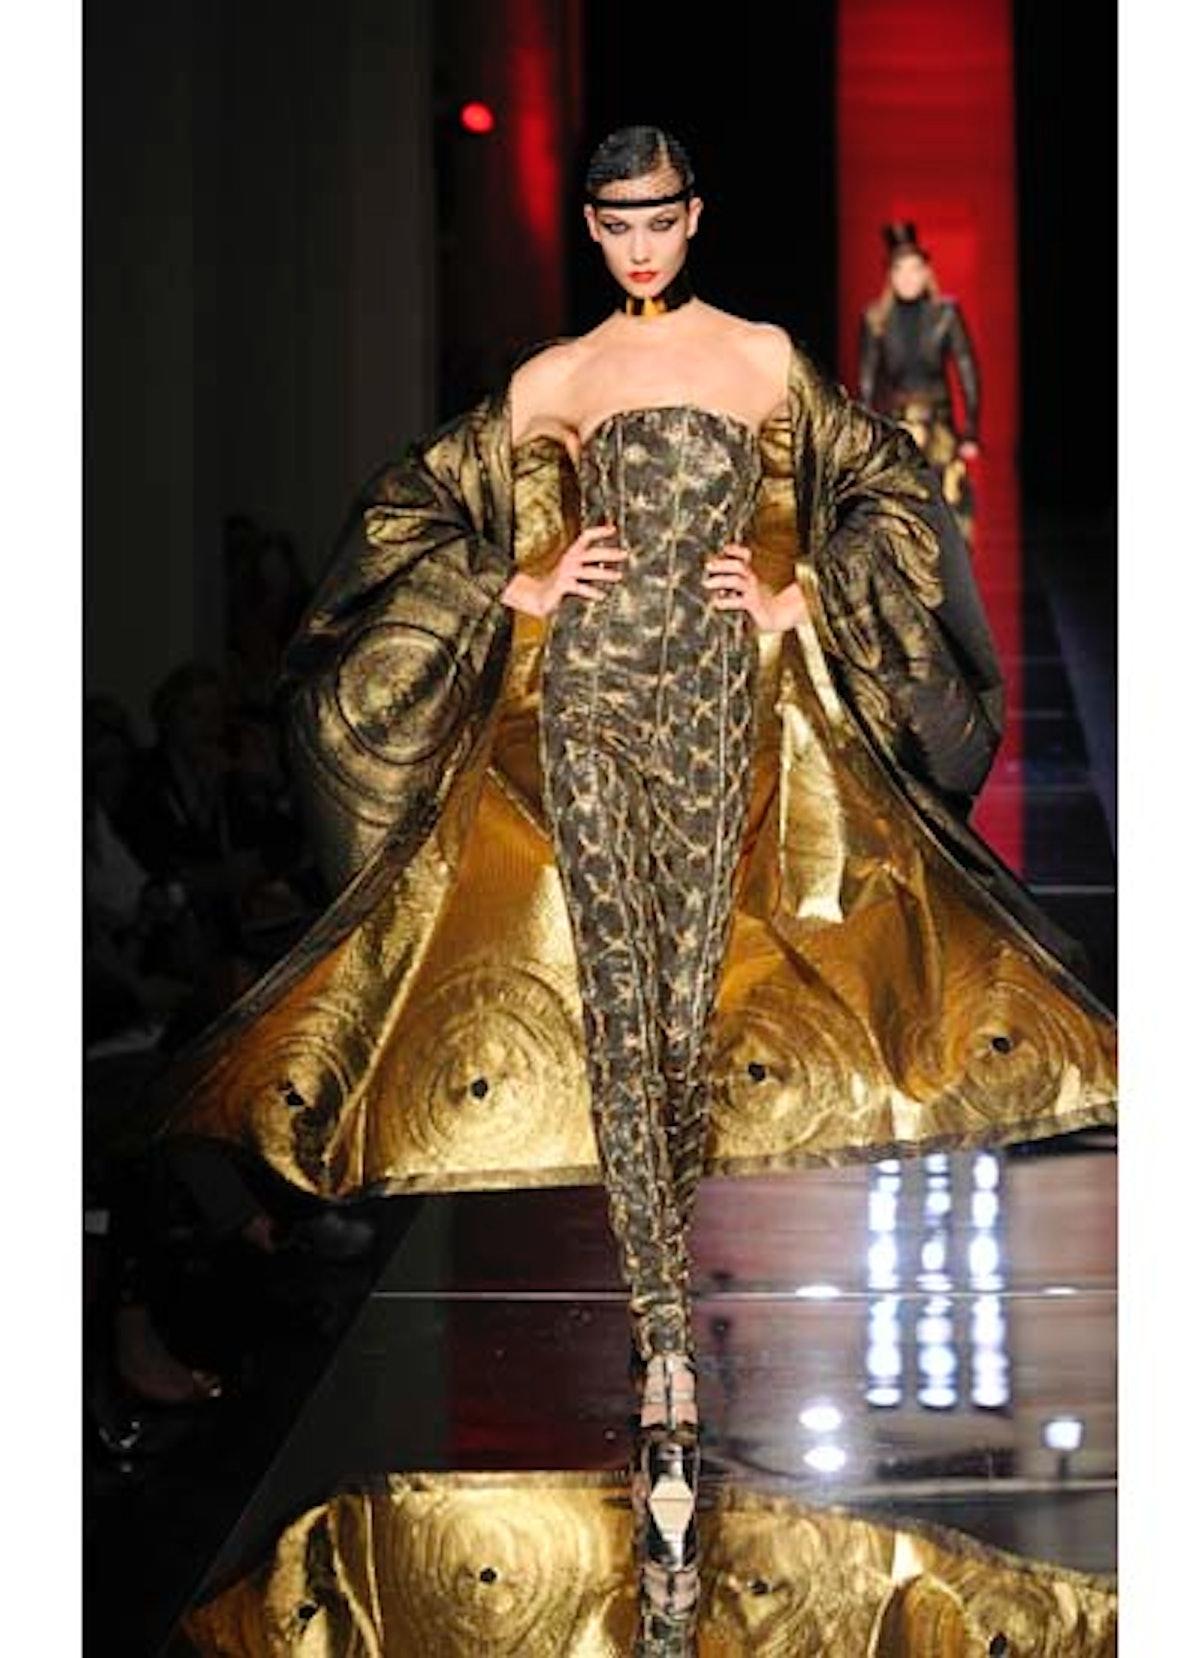 fass-jean-paul-gaultier-couture-2012-runway-42-v.jpg